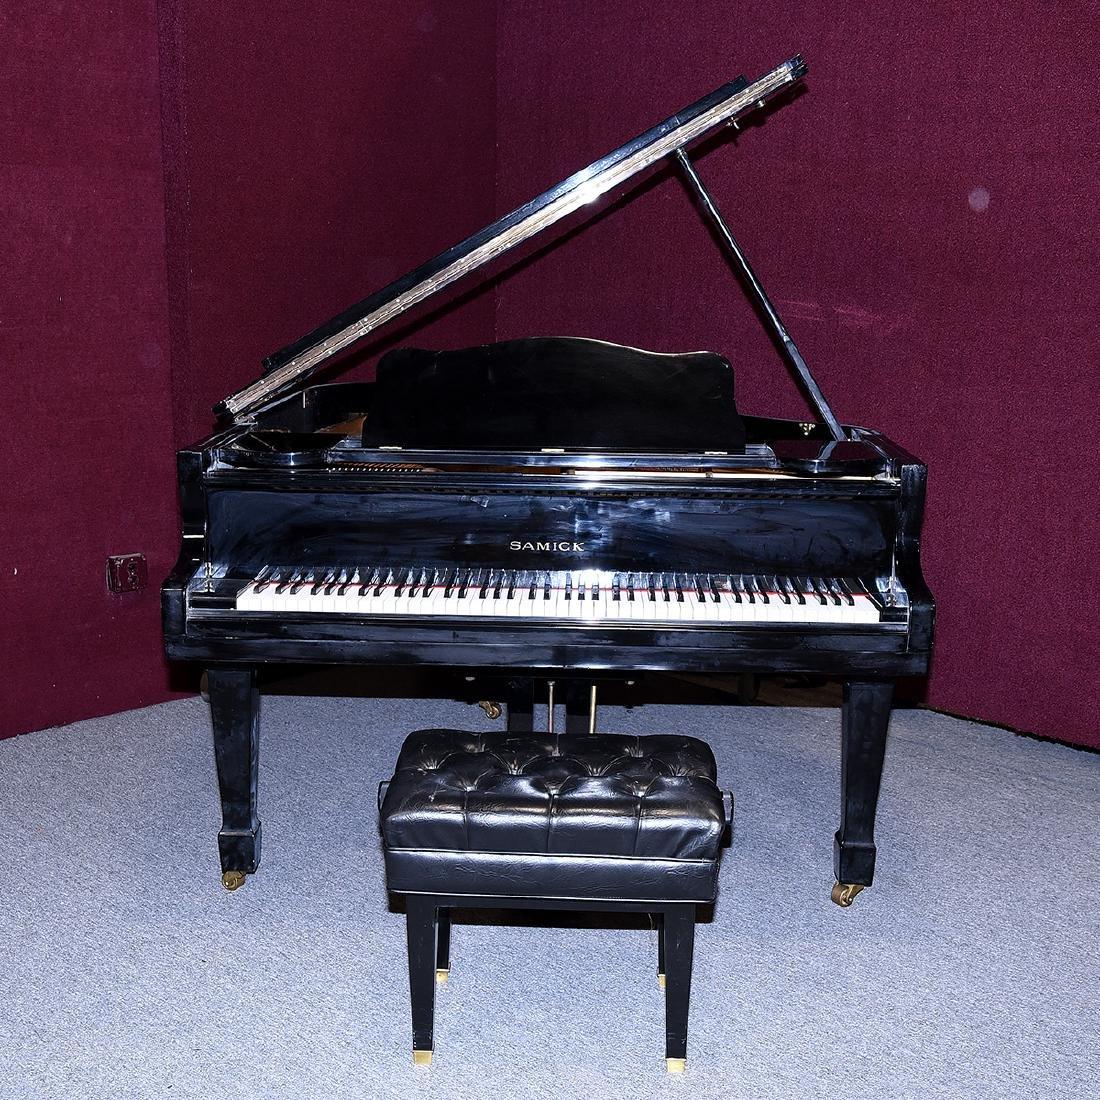 Samick Ebonized Grand Piano and Bench - 2